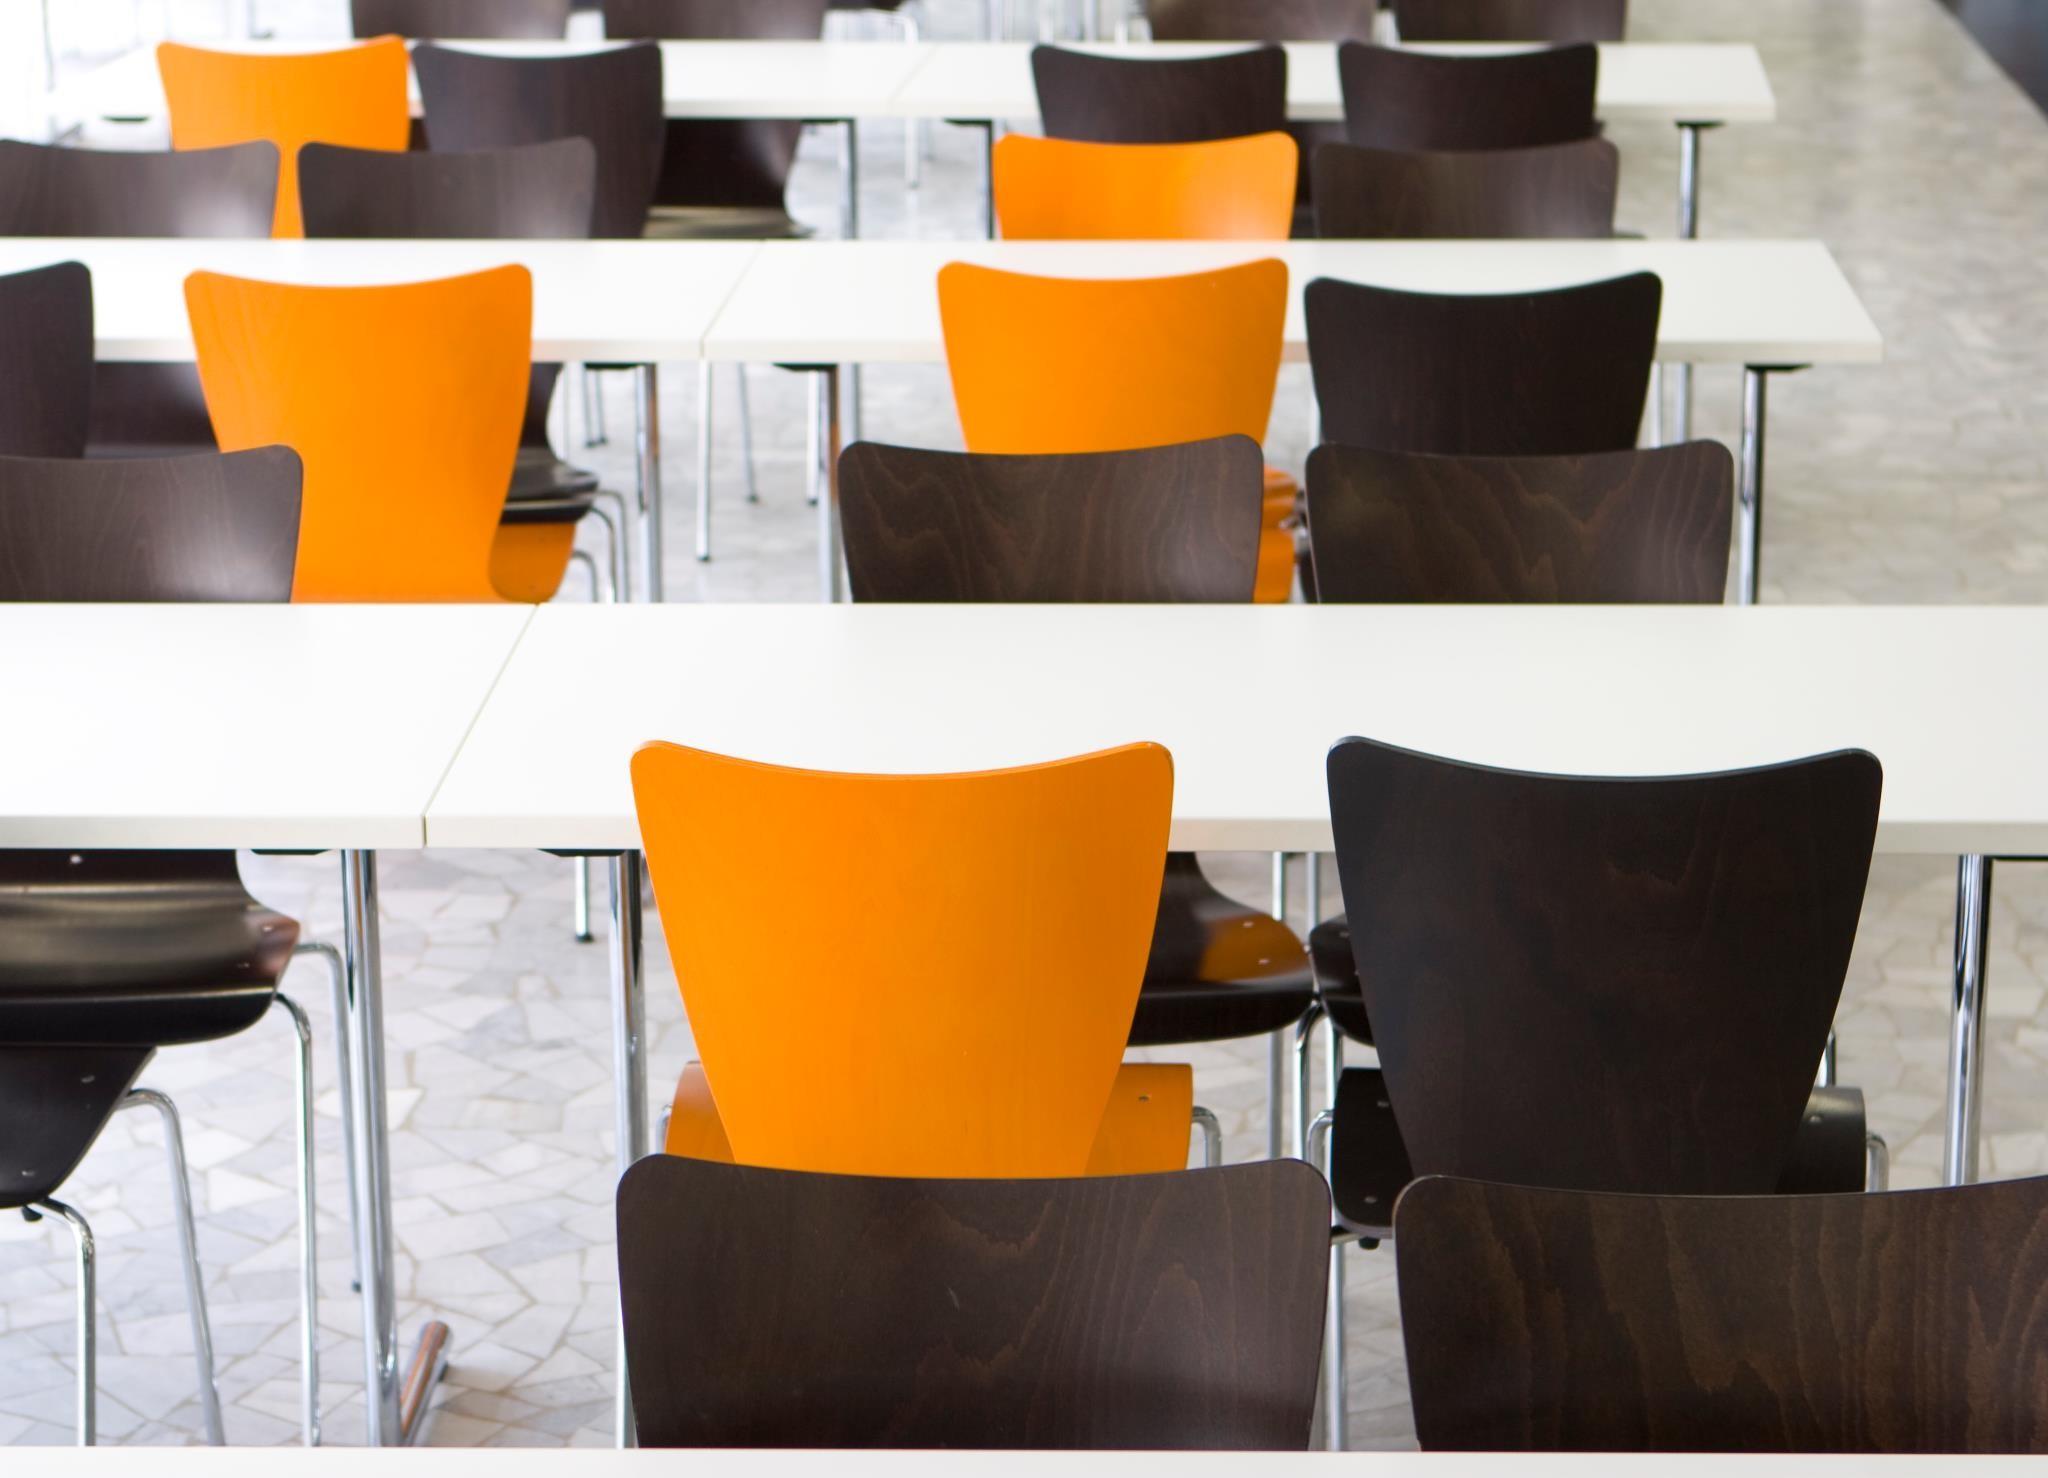 University Of Applied Sciences And Arts Dortmund Linkedin